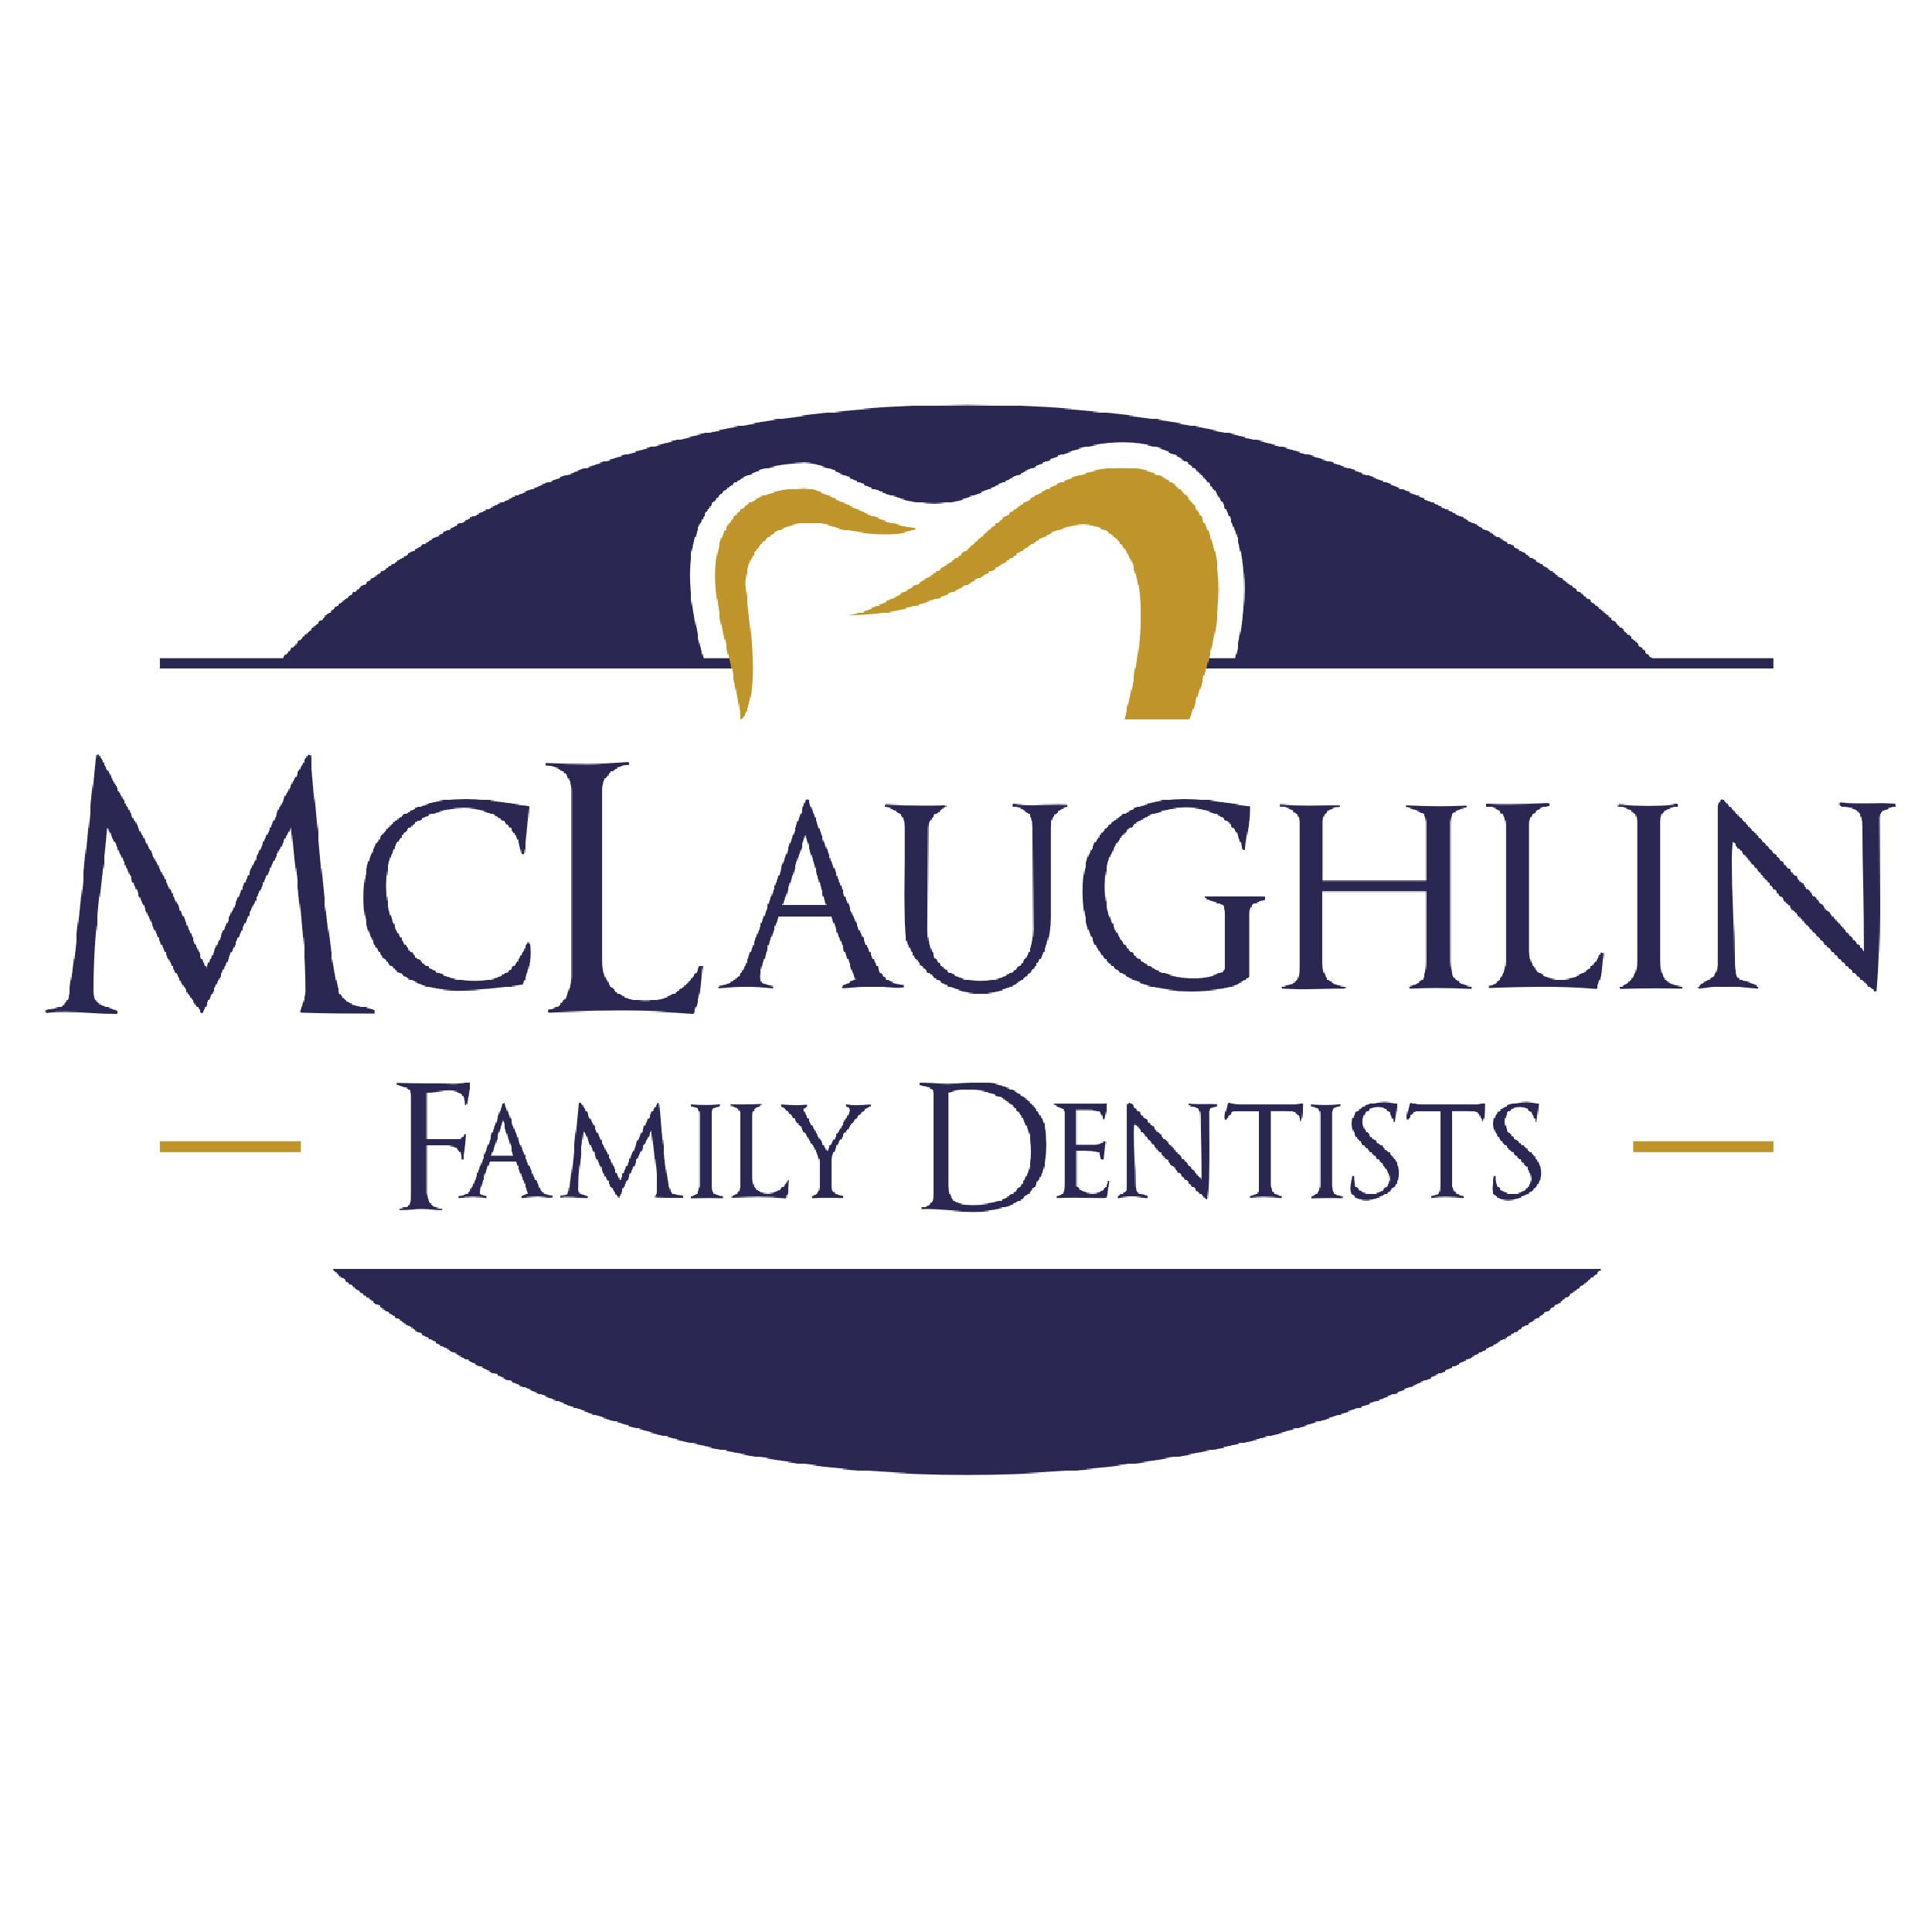 McLaughlin Family Dentists - Leominster